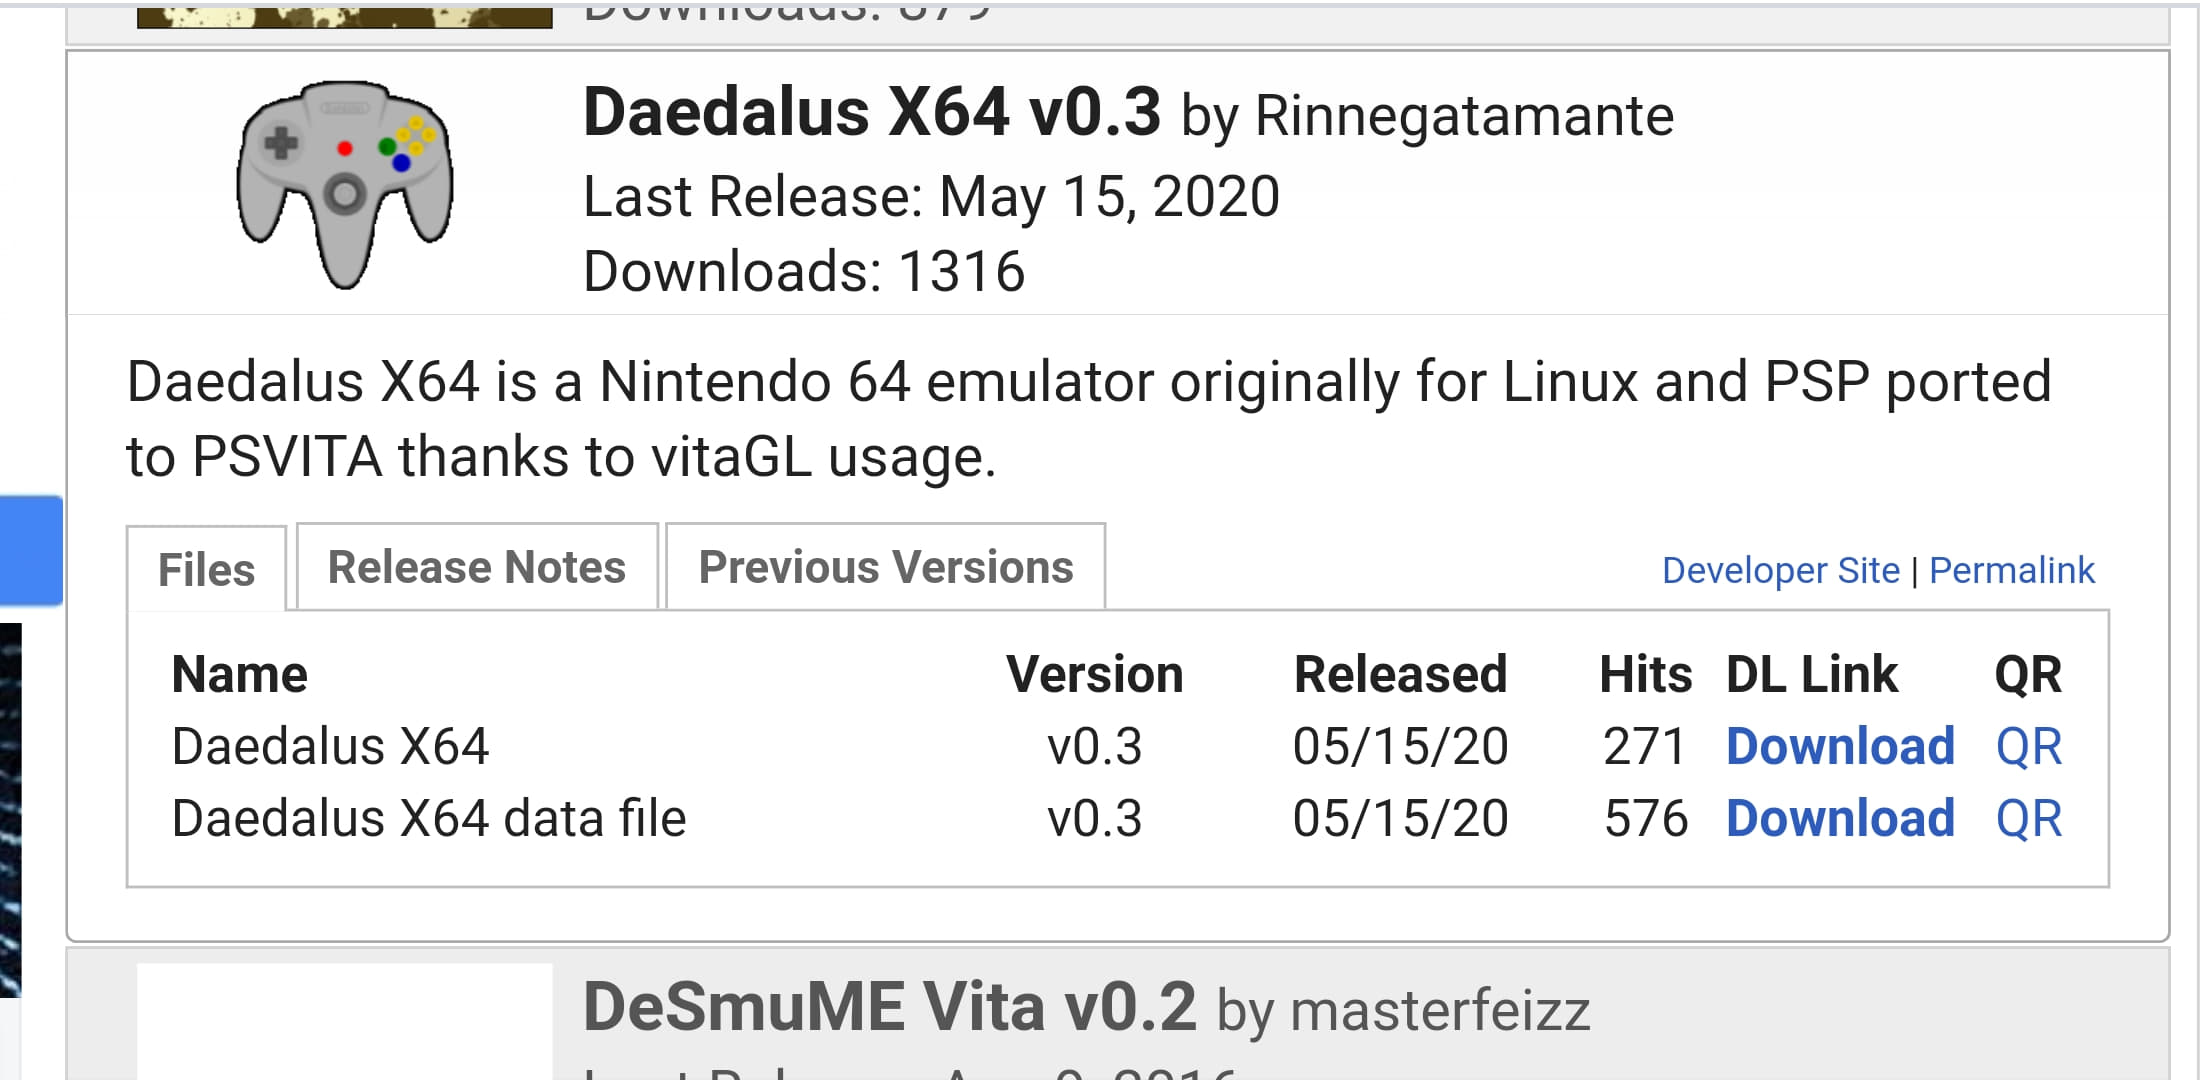 Daedalus X64